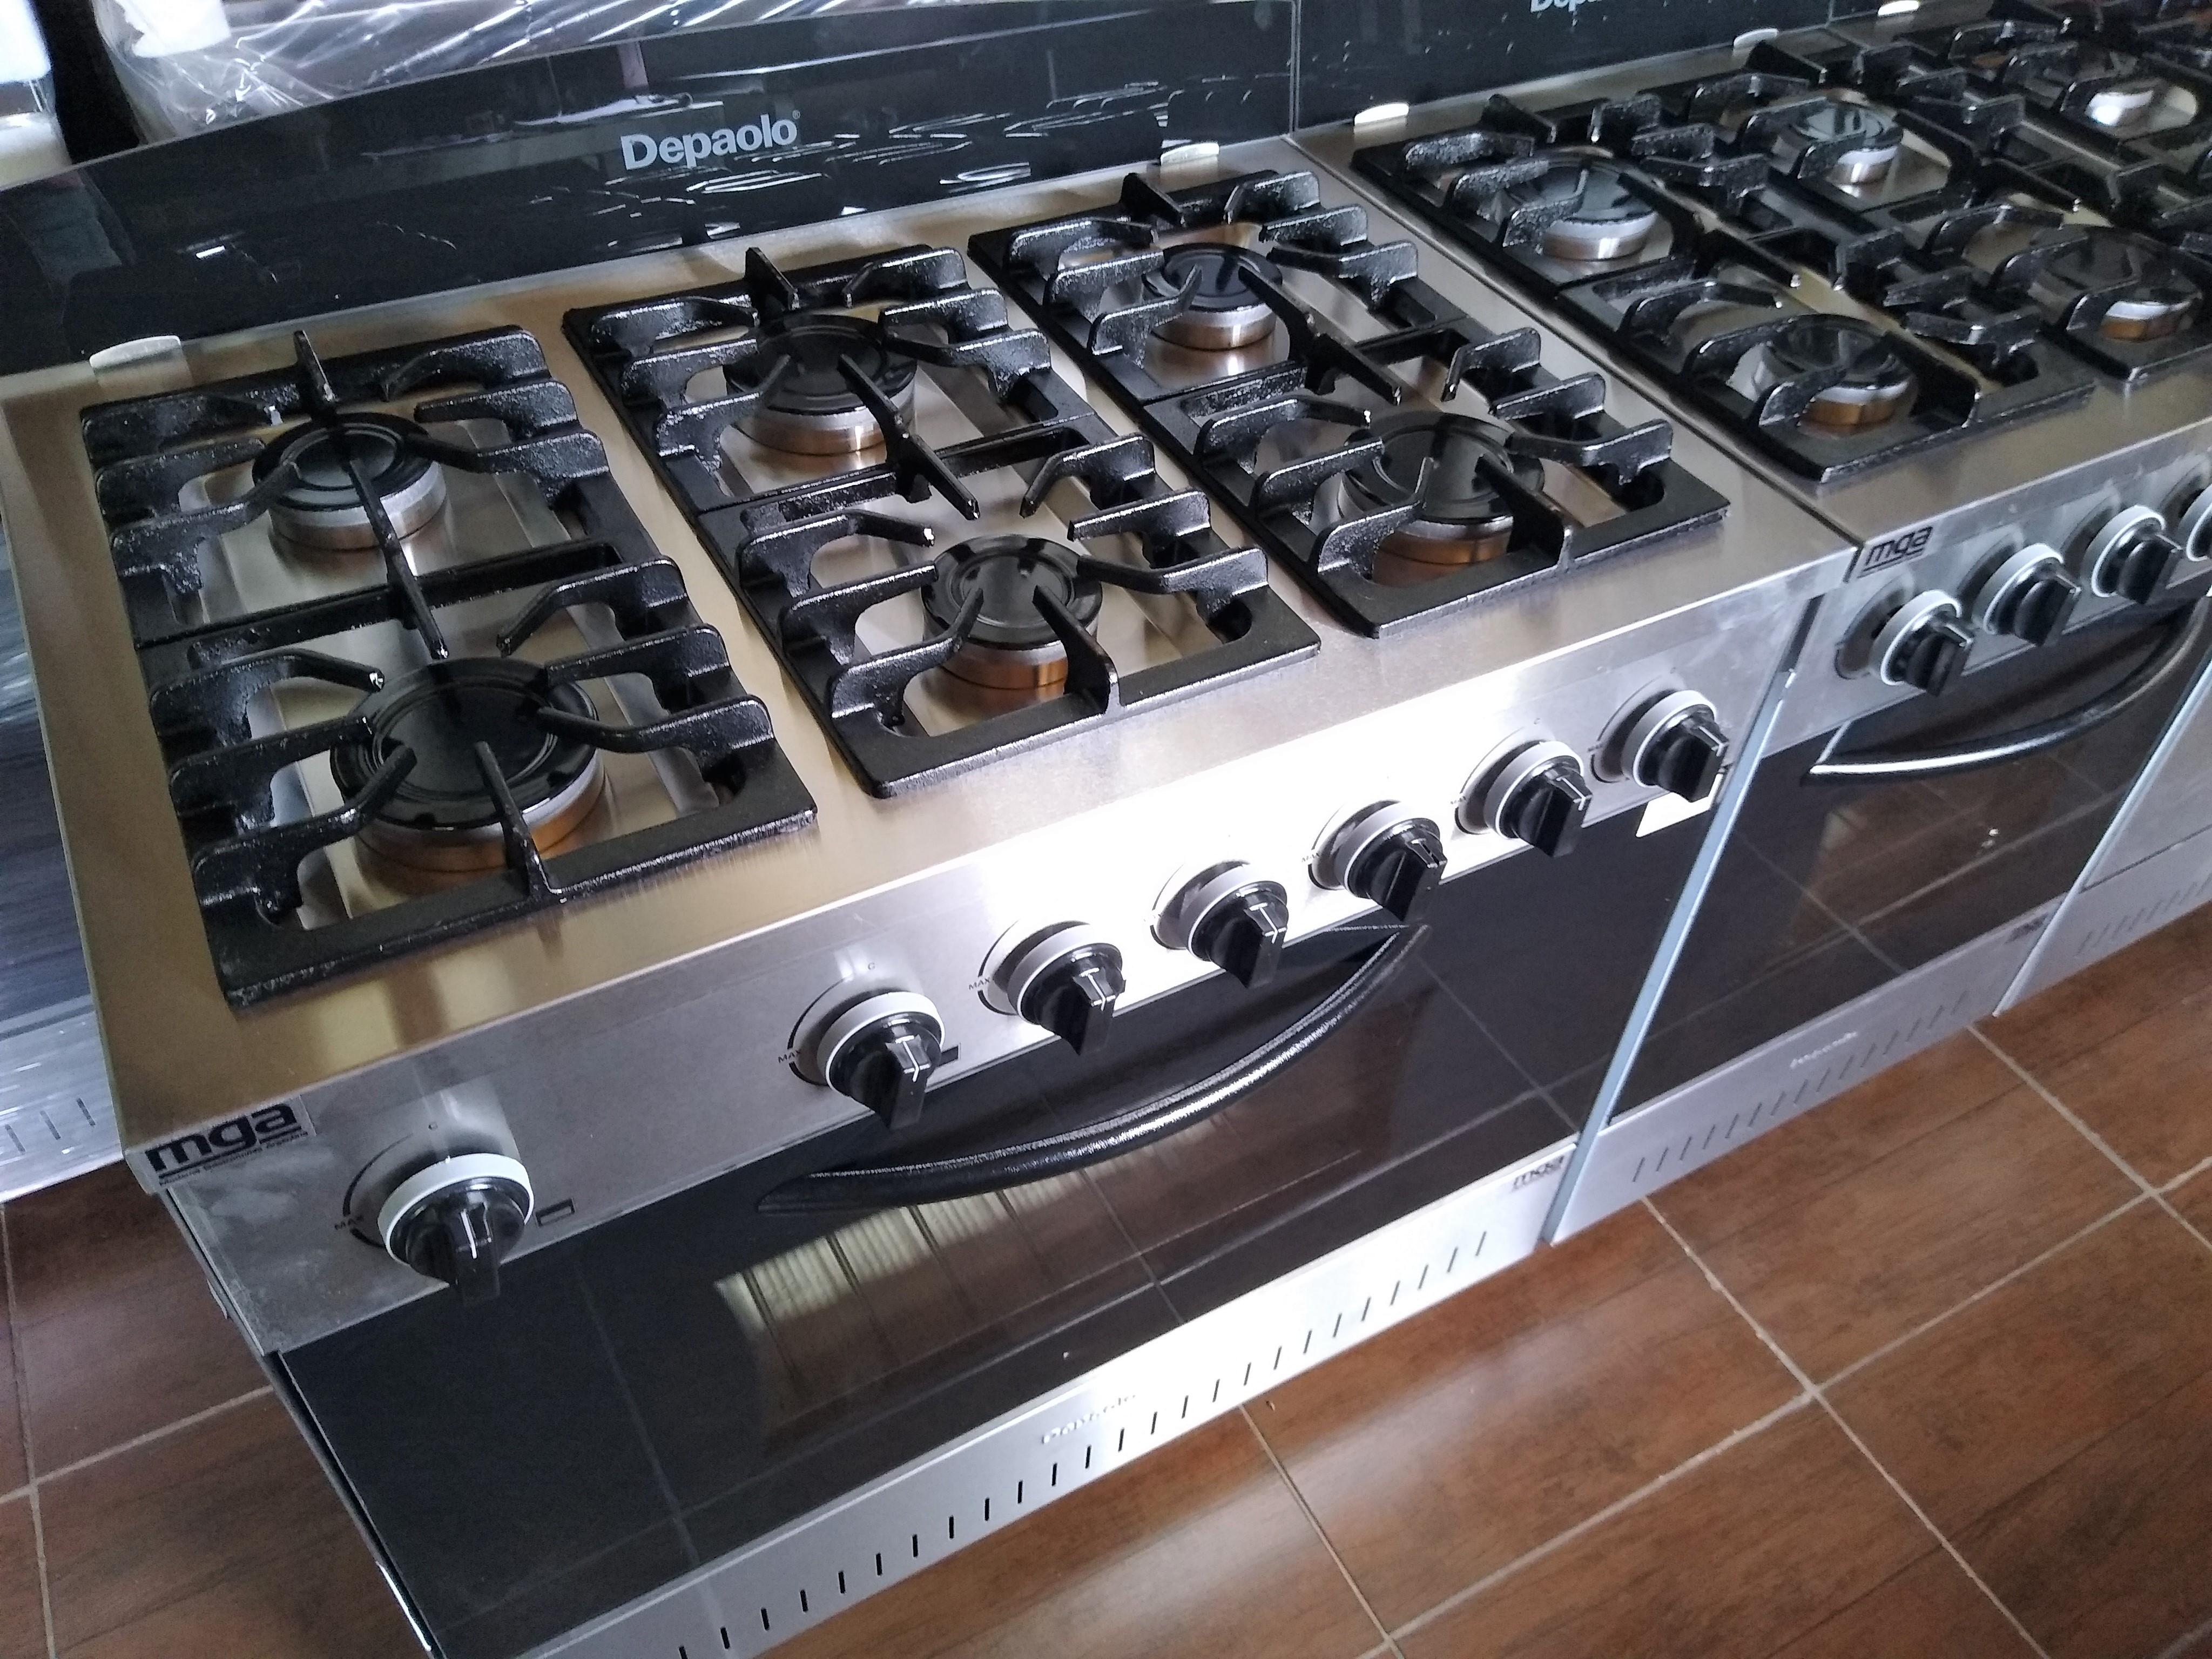 Cocina industrial Depaolo Ituzaingo 6 hornallas